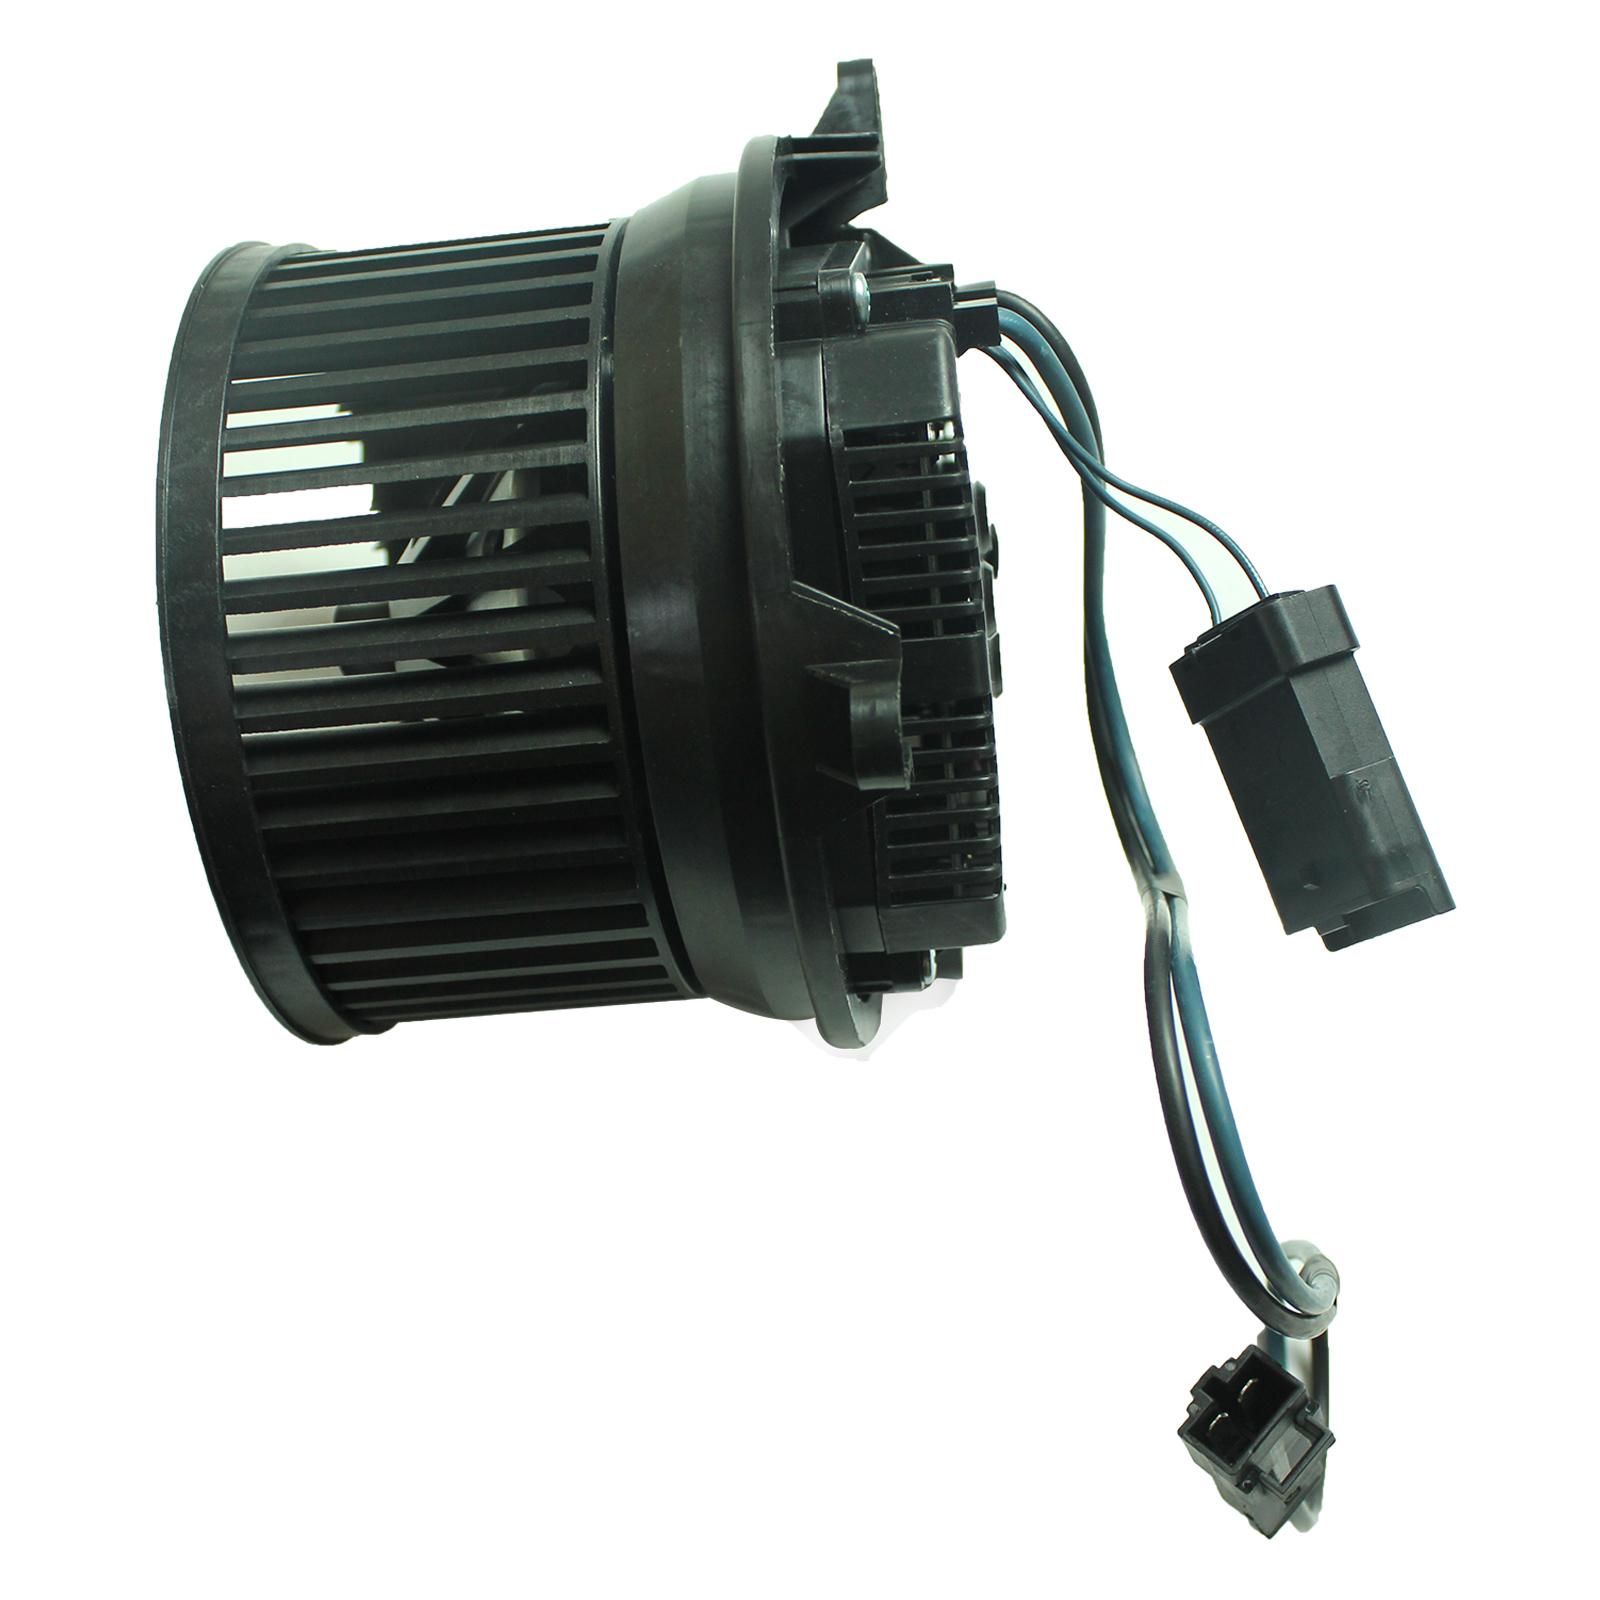 HVAC Blower Motor for 03-15 Freightliner M2 106 VCC35000003 Truck Line |  eBayeBay